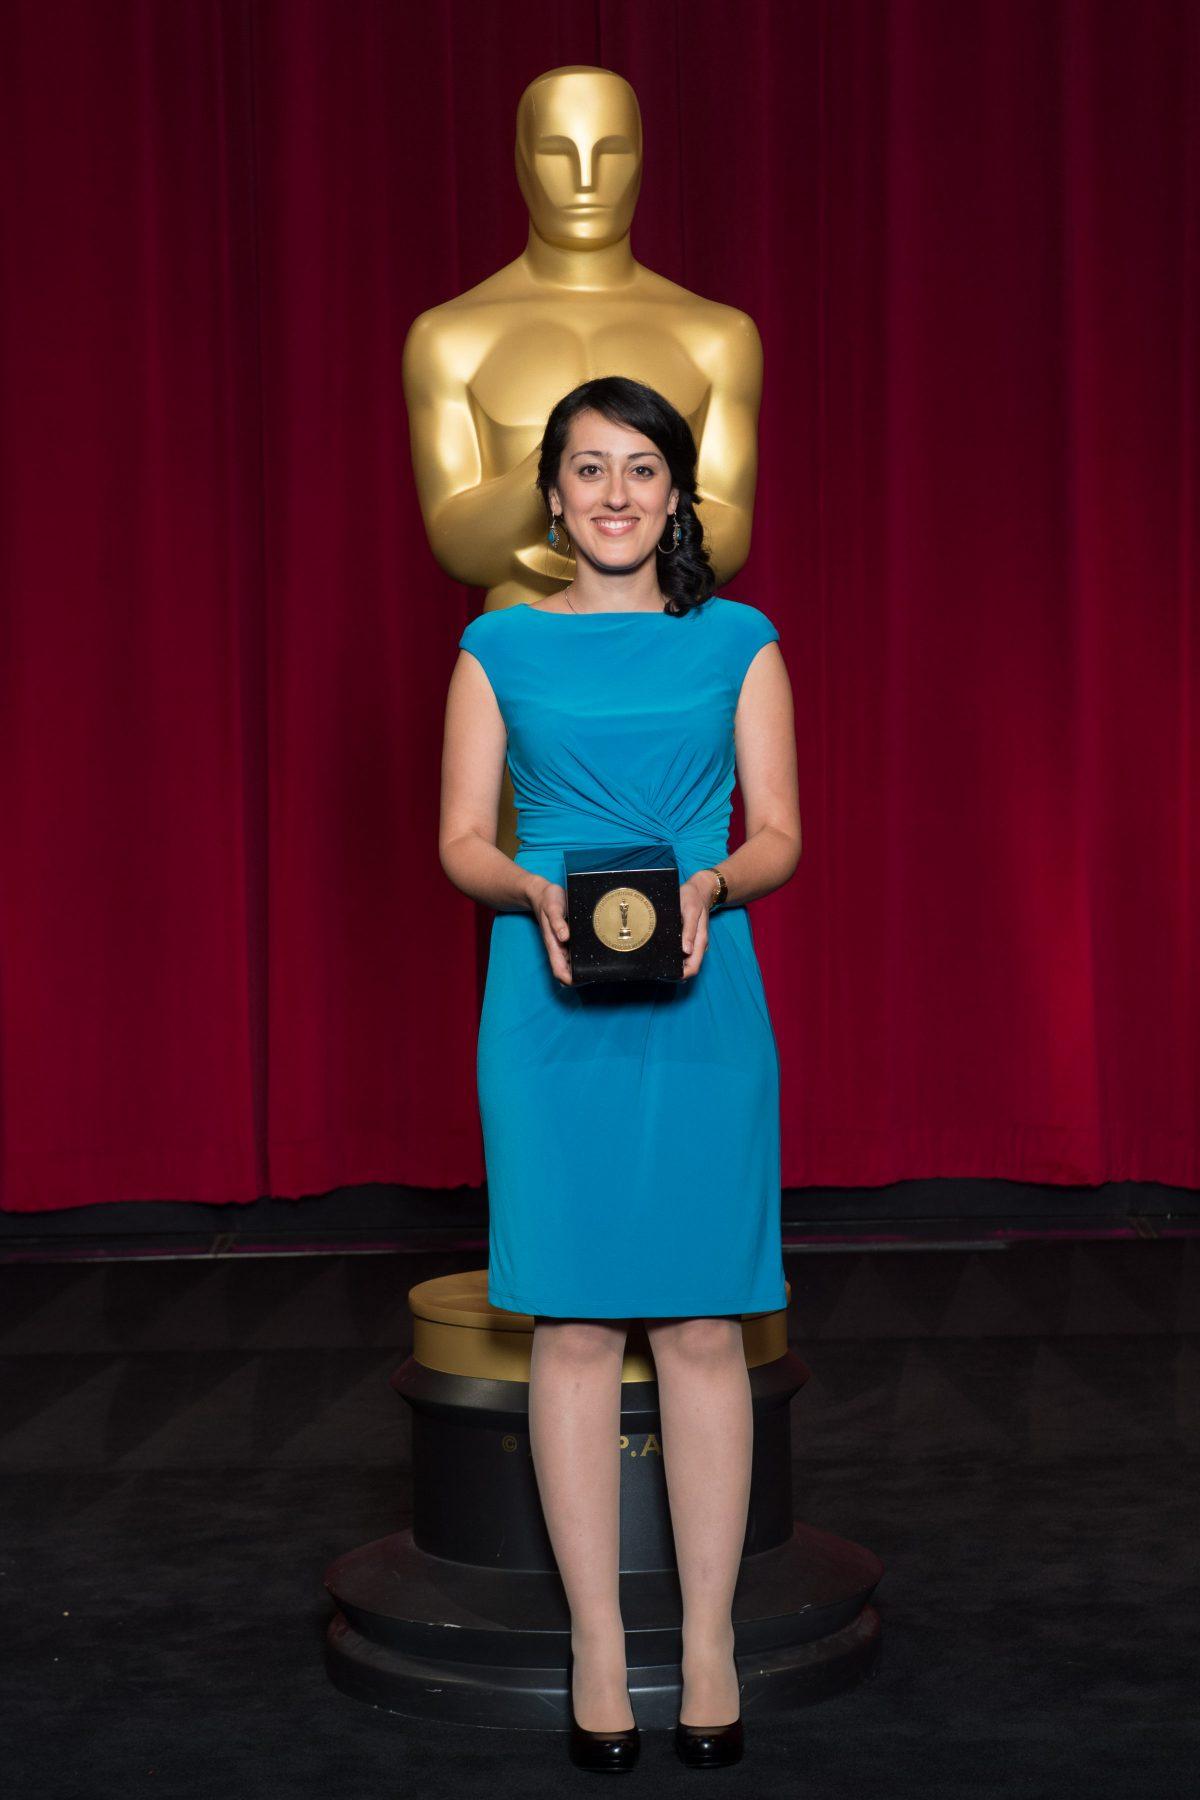 Student Academy Awards, Presentation Portraits